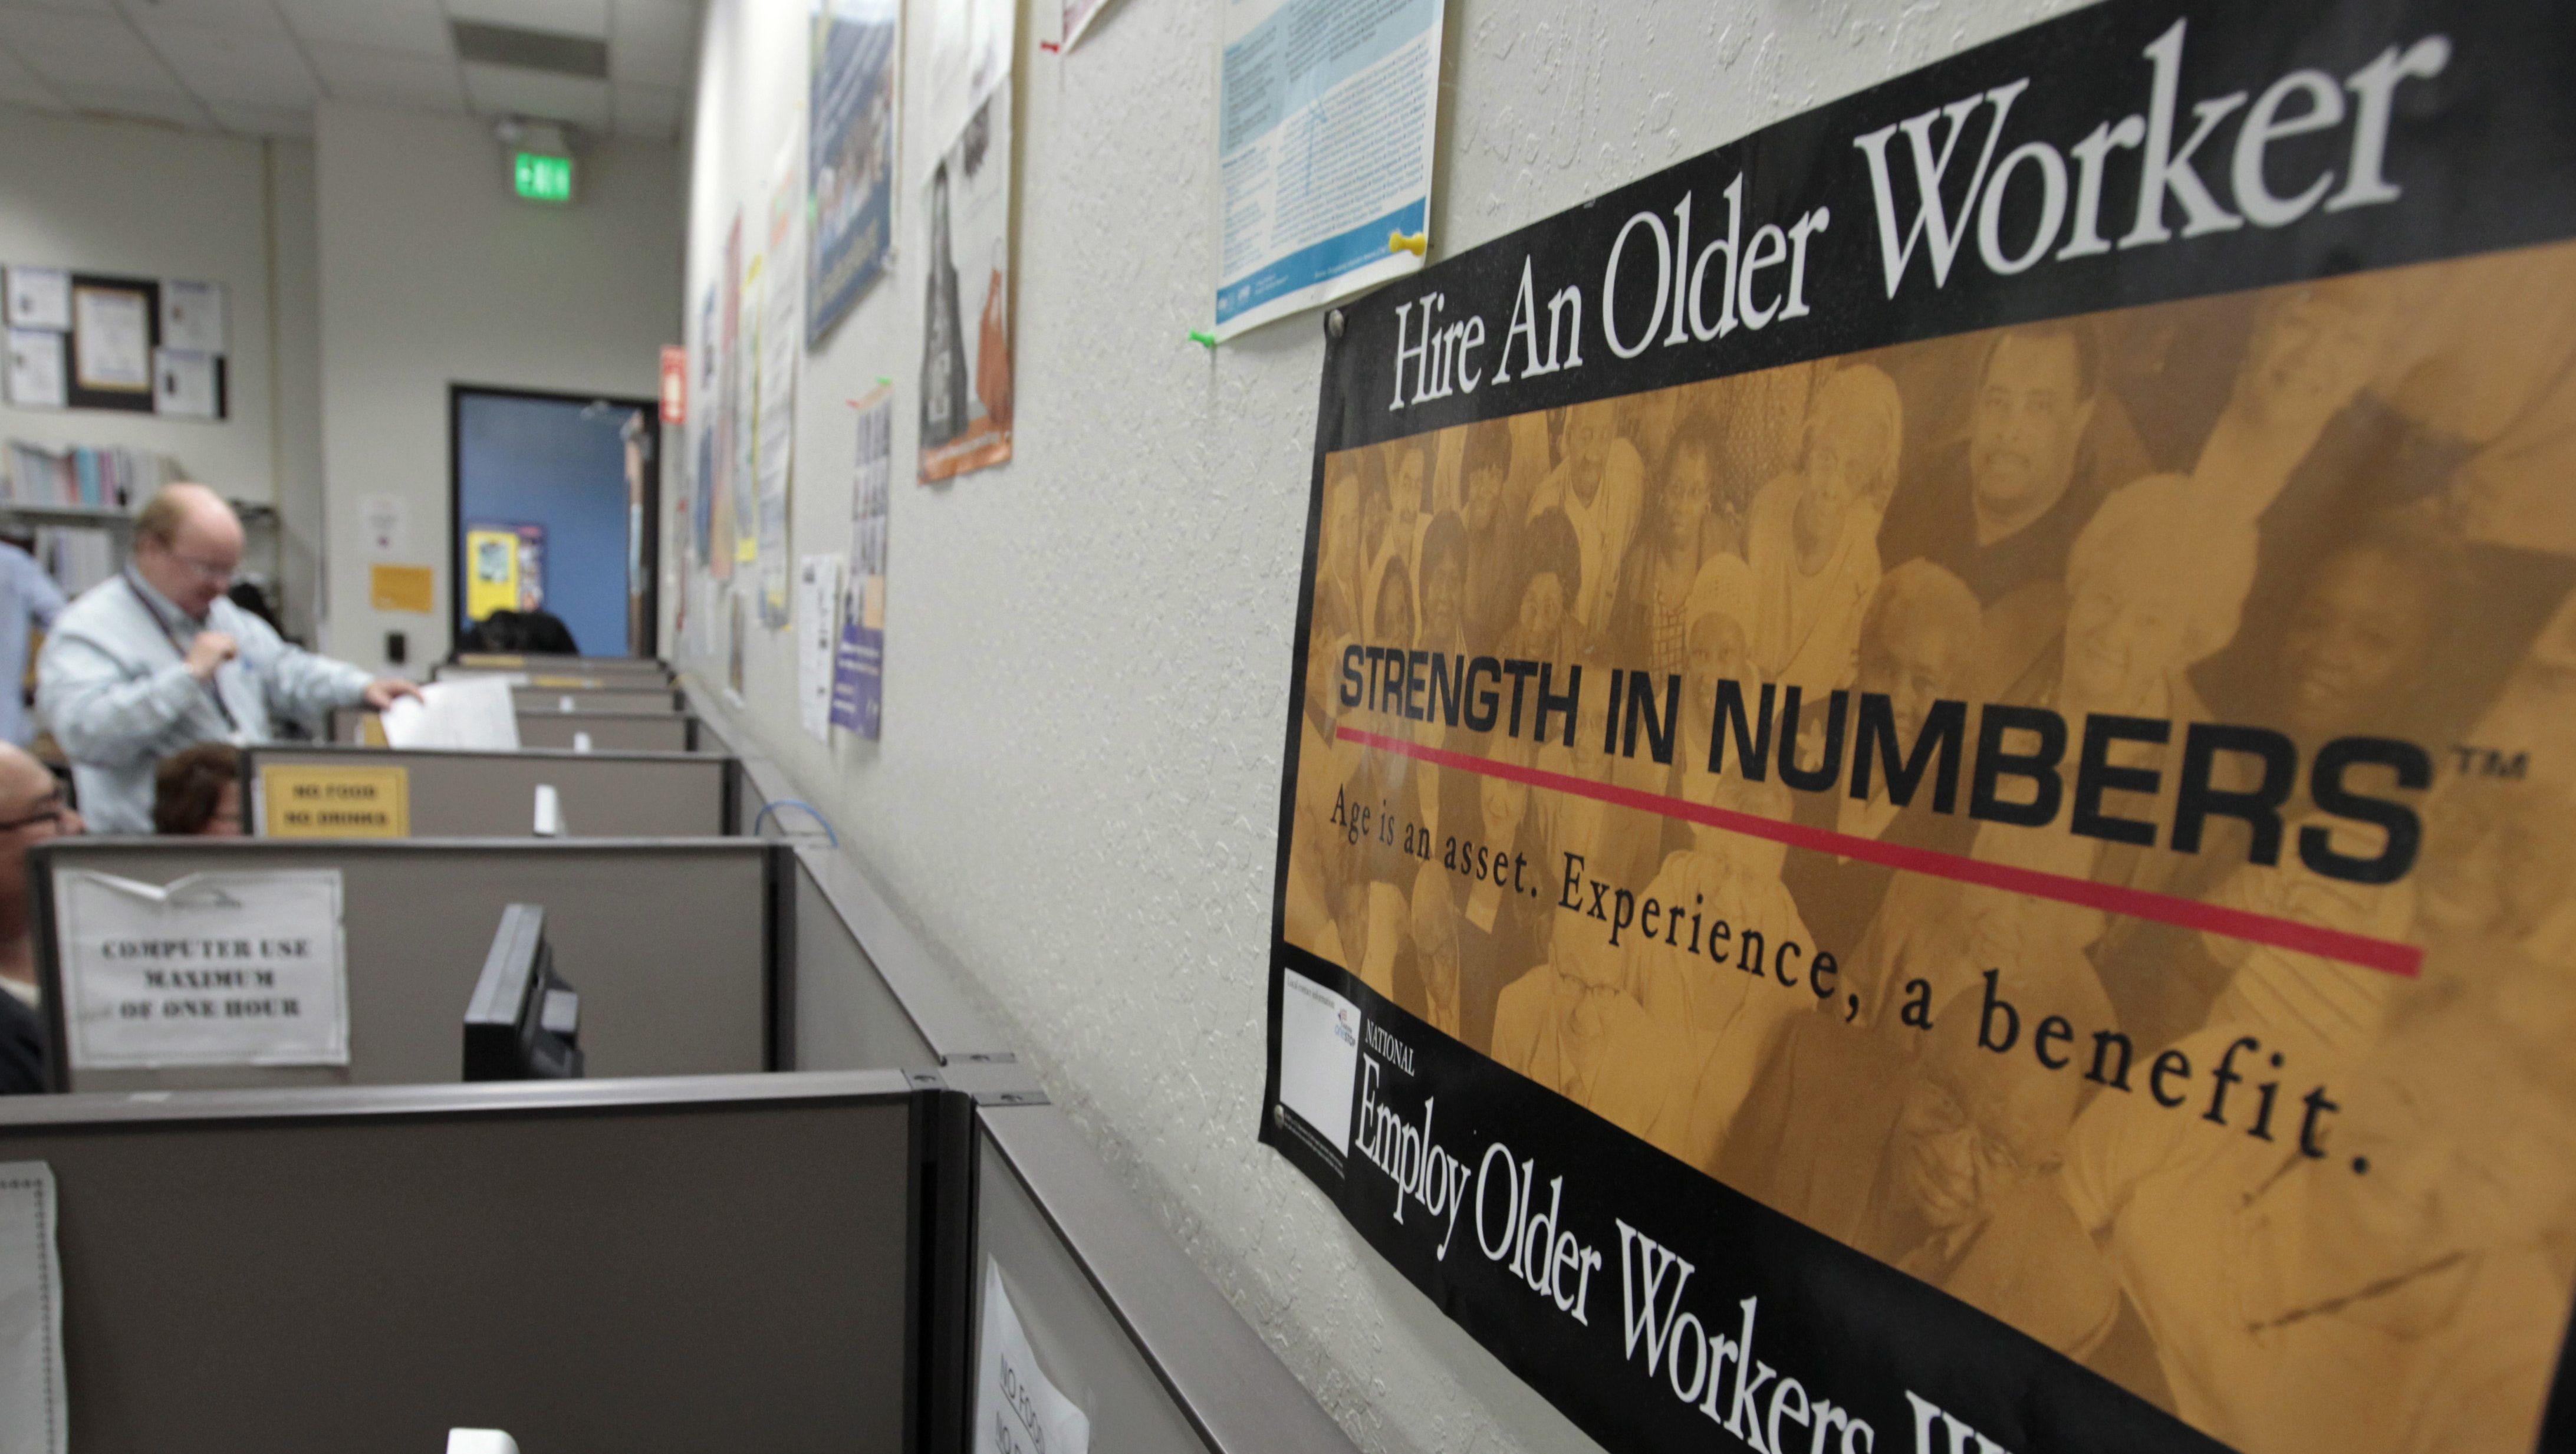 Older workers face age discrimination